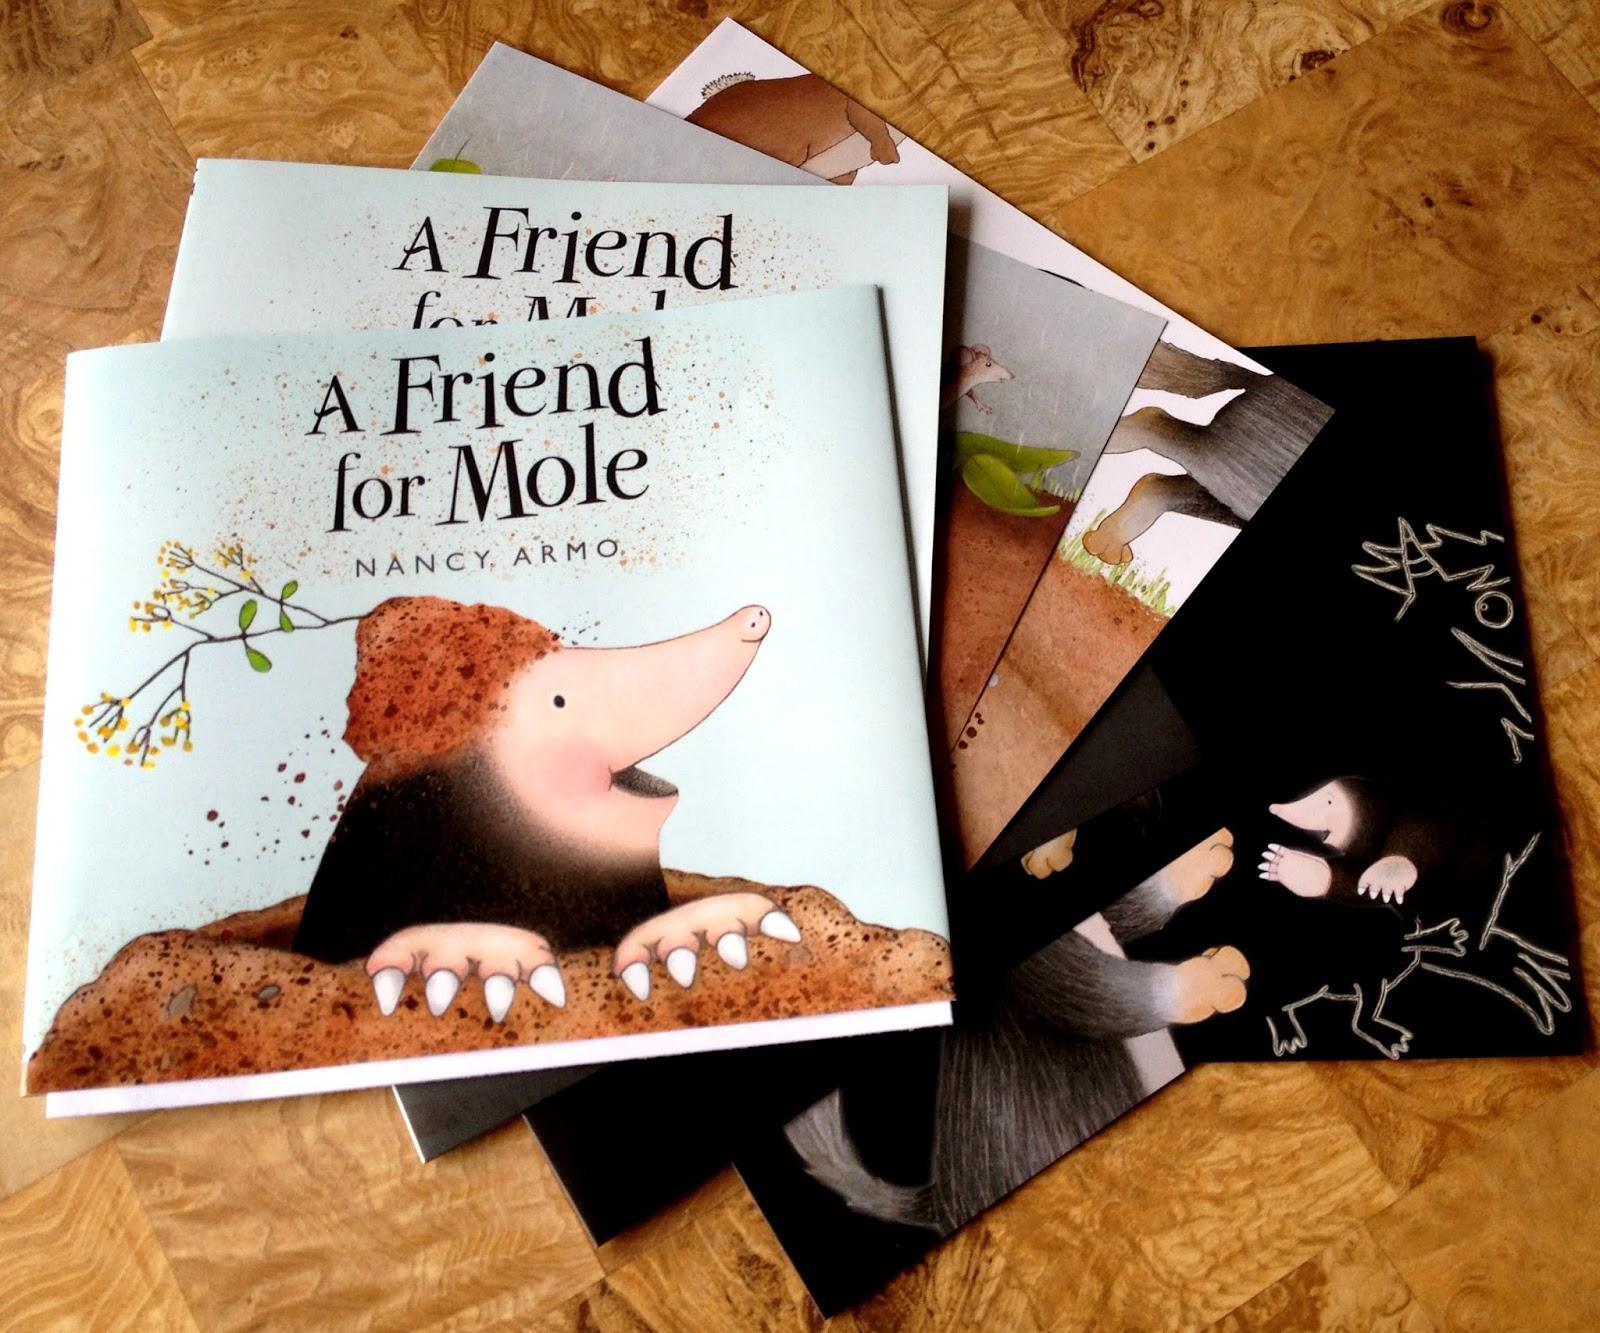 F&G of A Friend for Mole